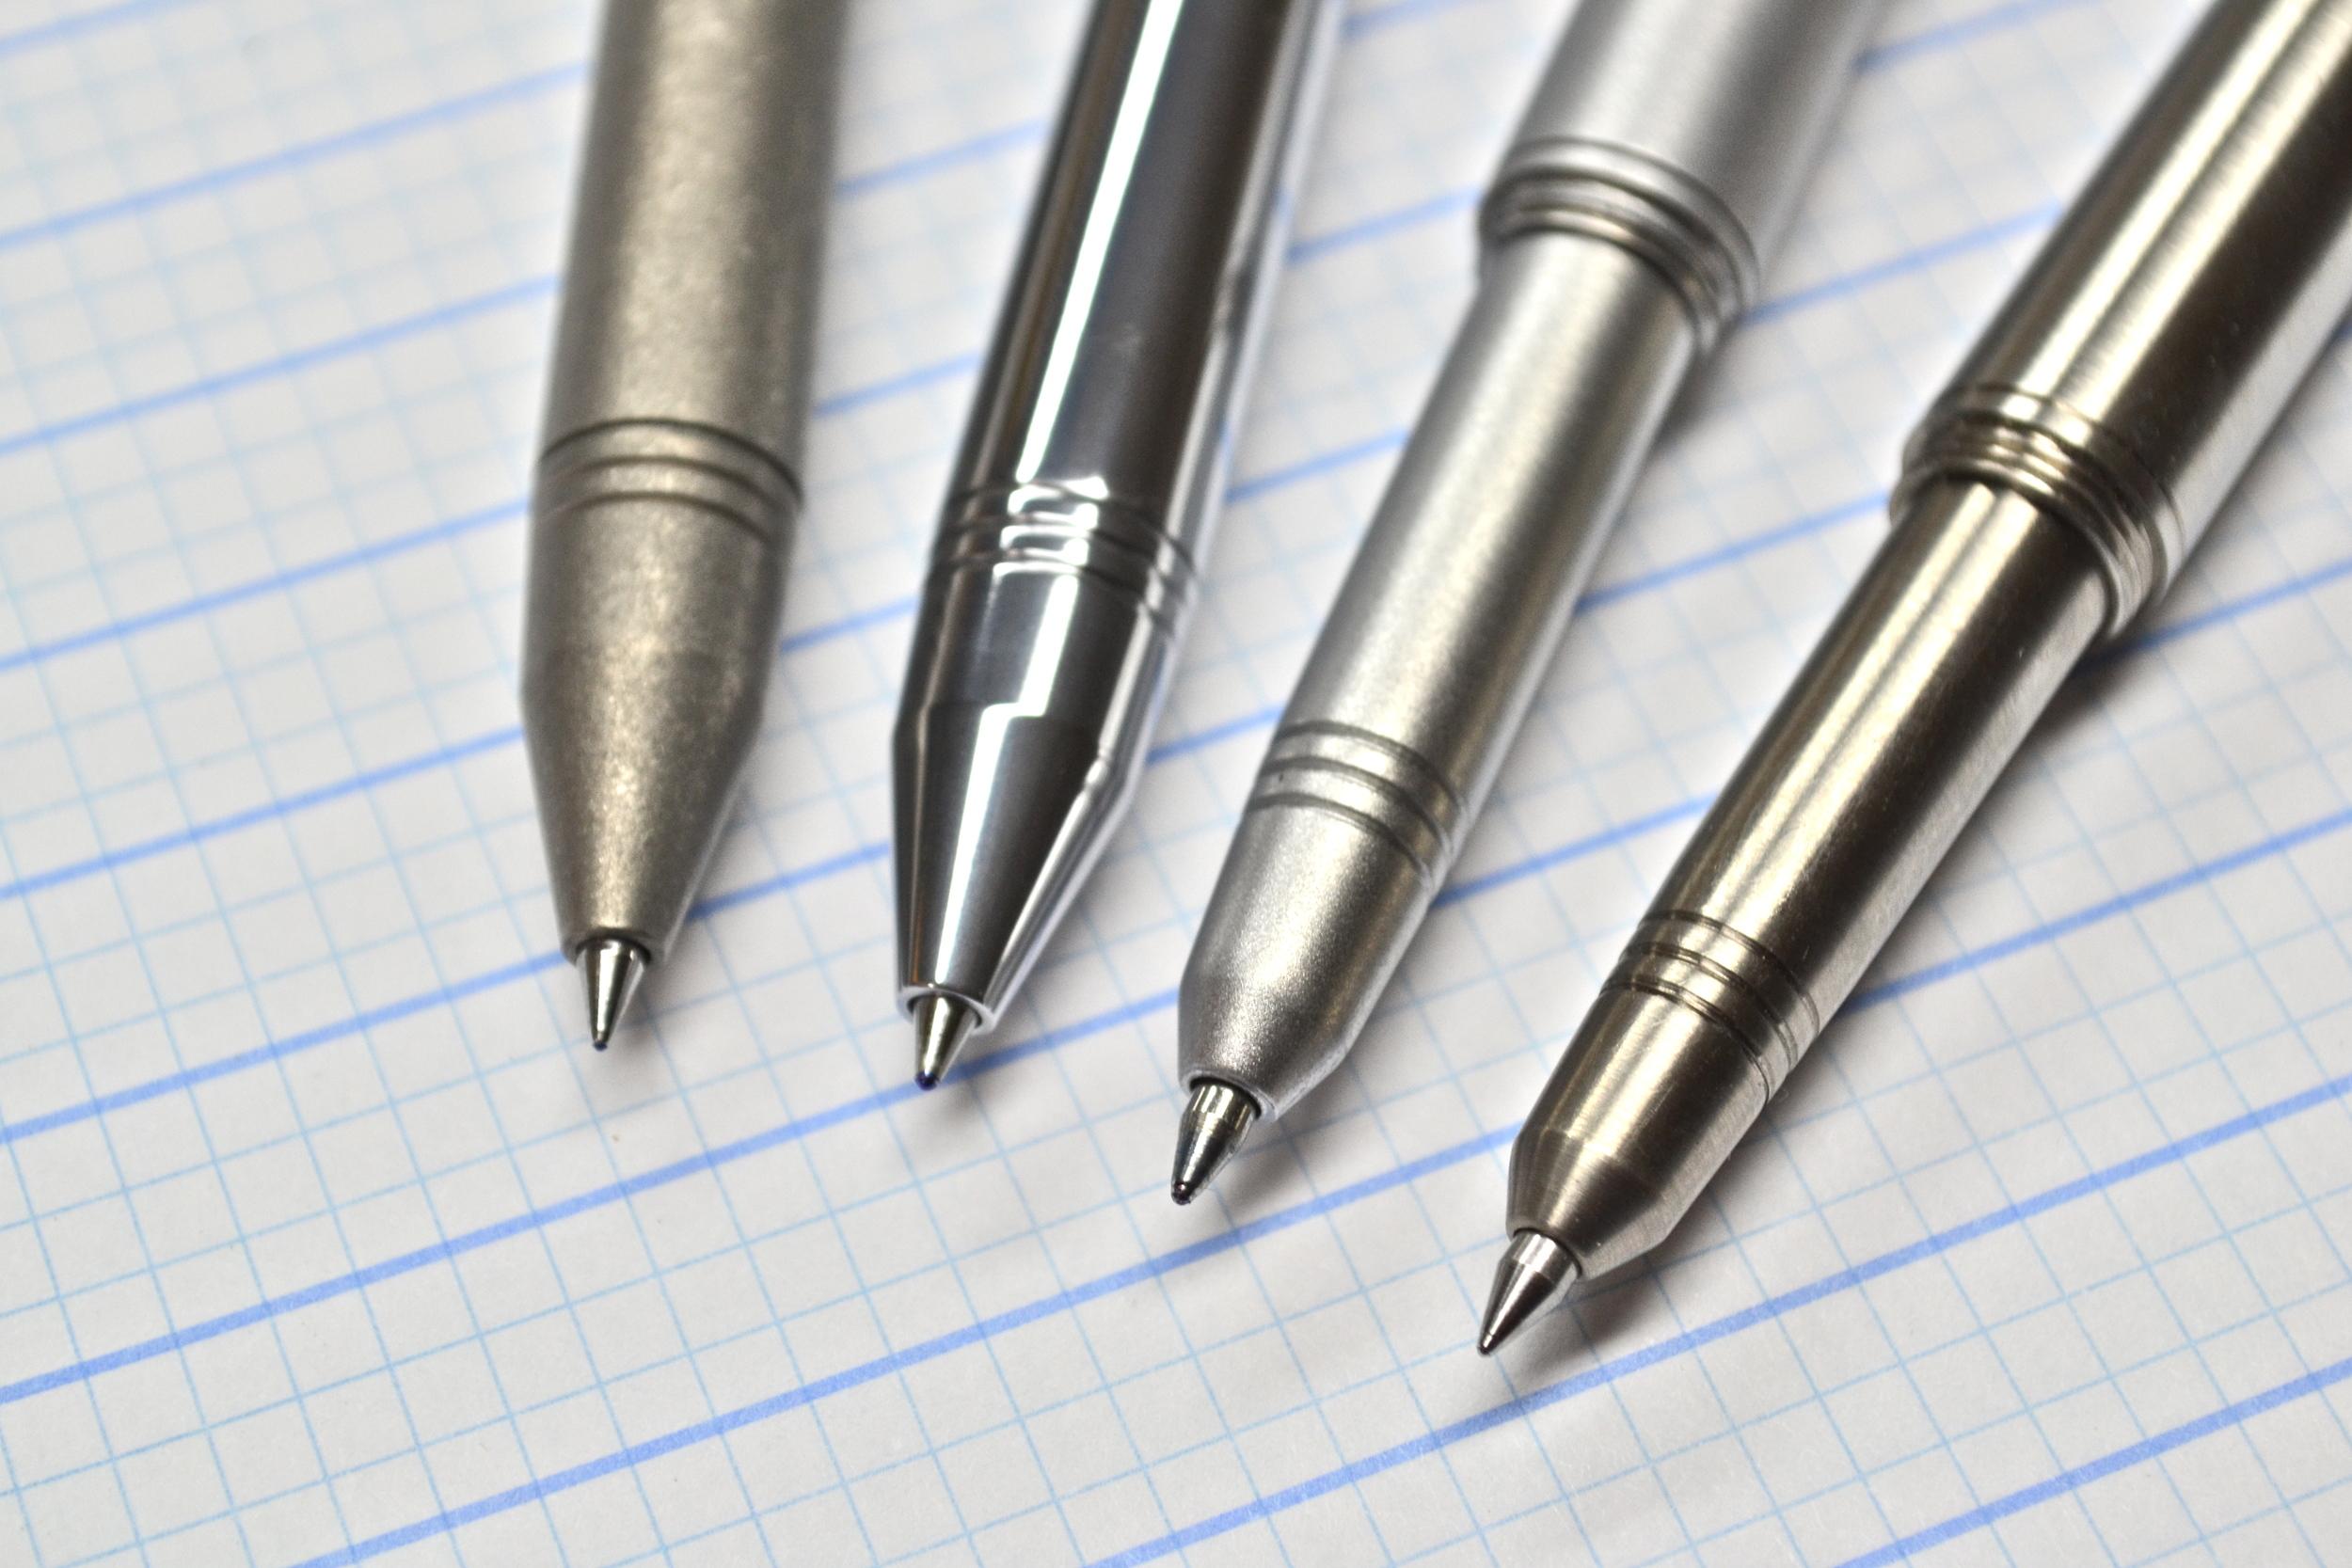 Ti-Post RAW Pen + Stylus Kickstarter Review